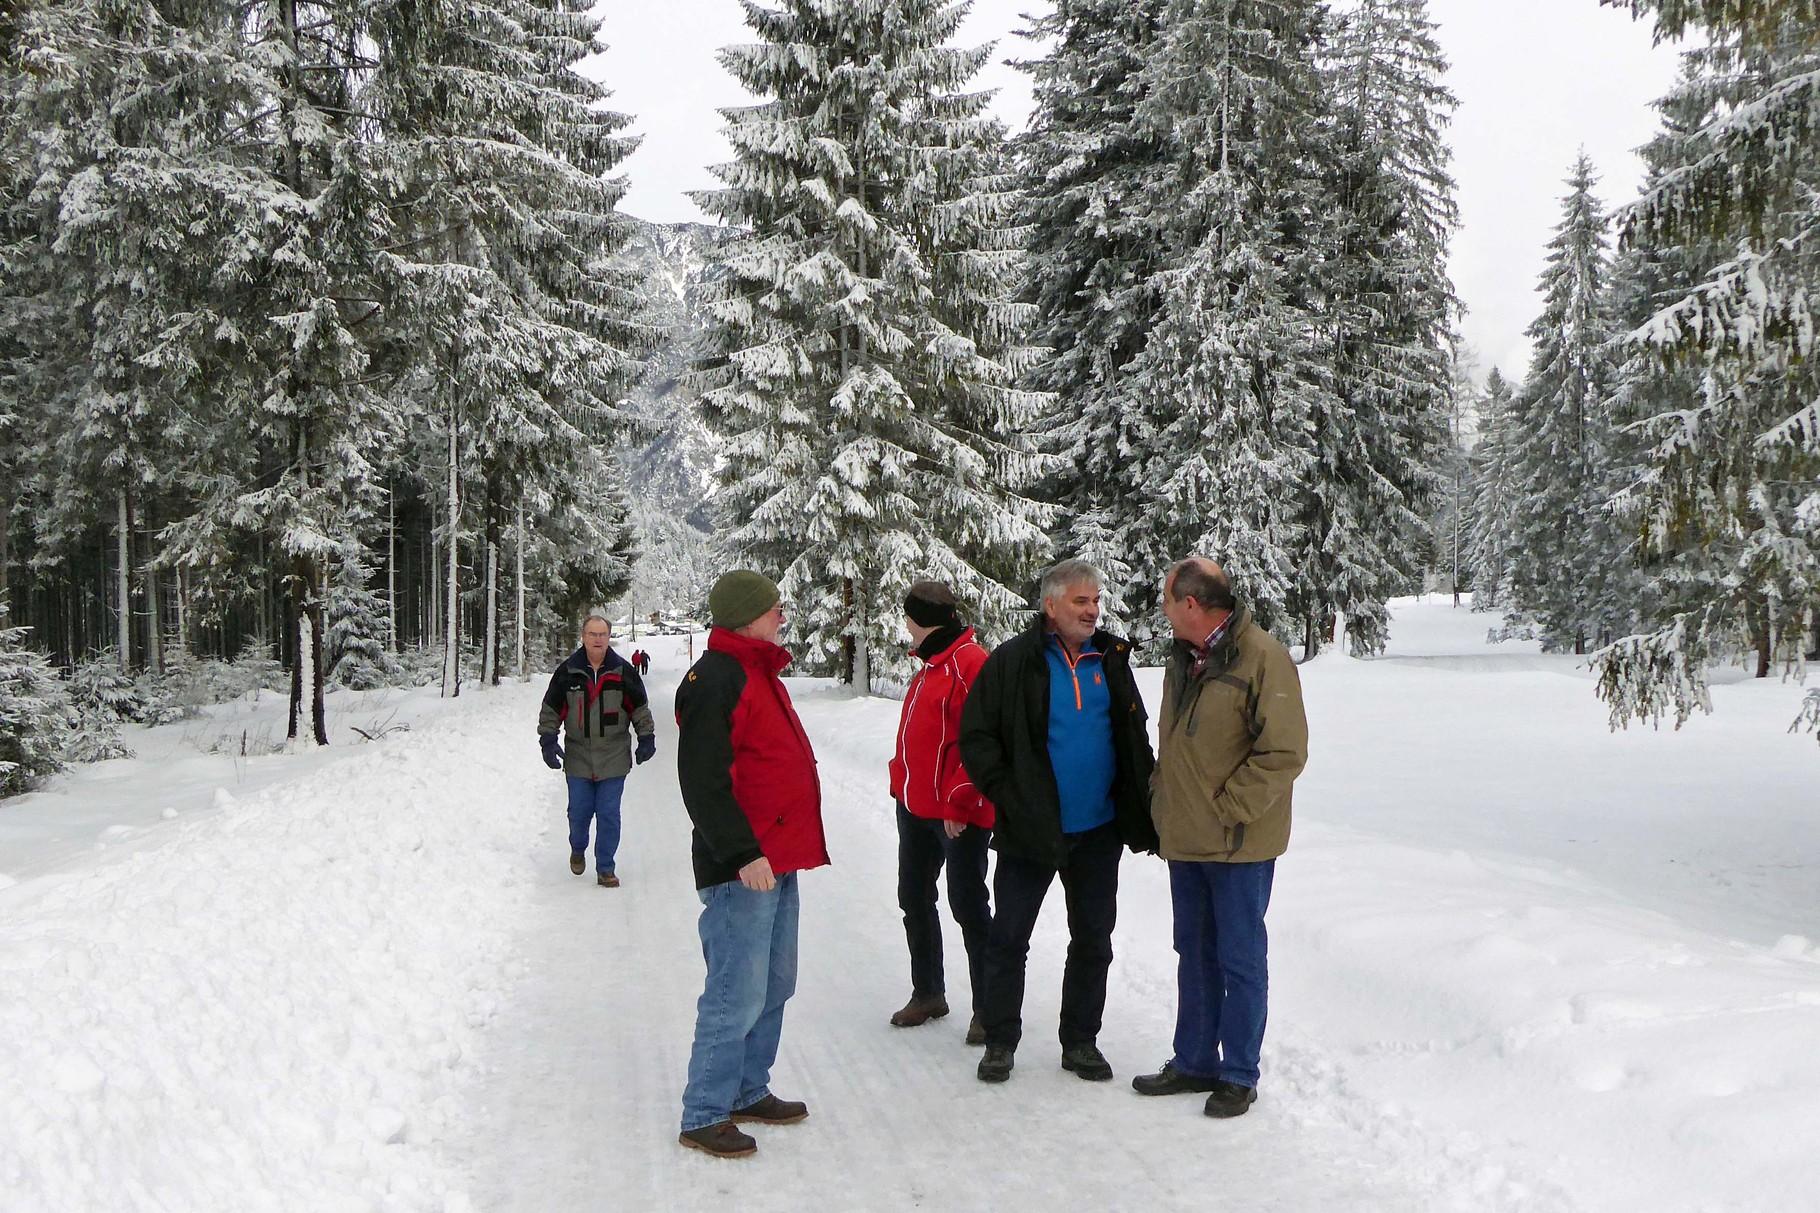 Auf dem Weg zum Gasthof Falzthurn